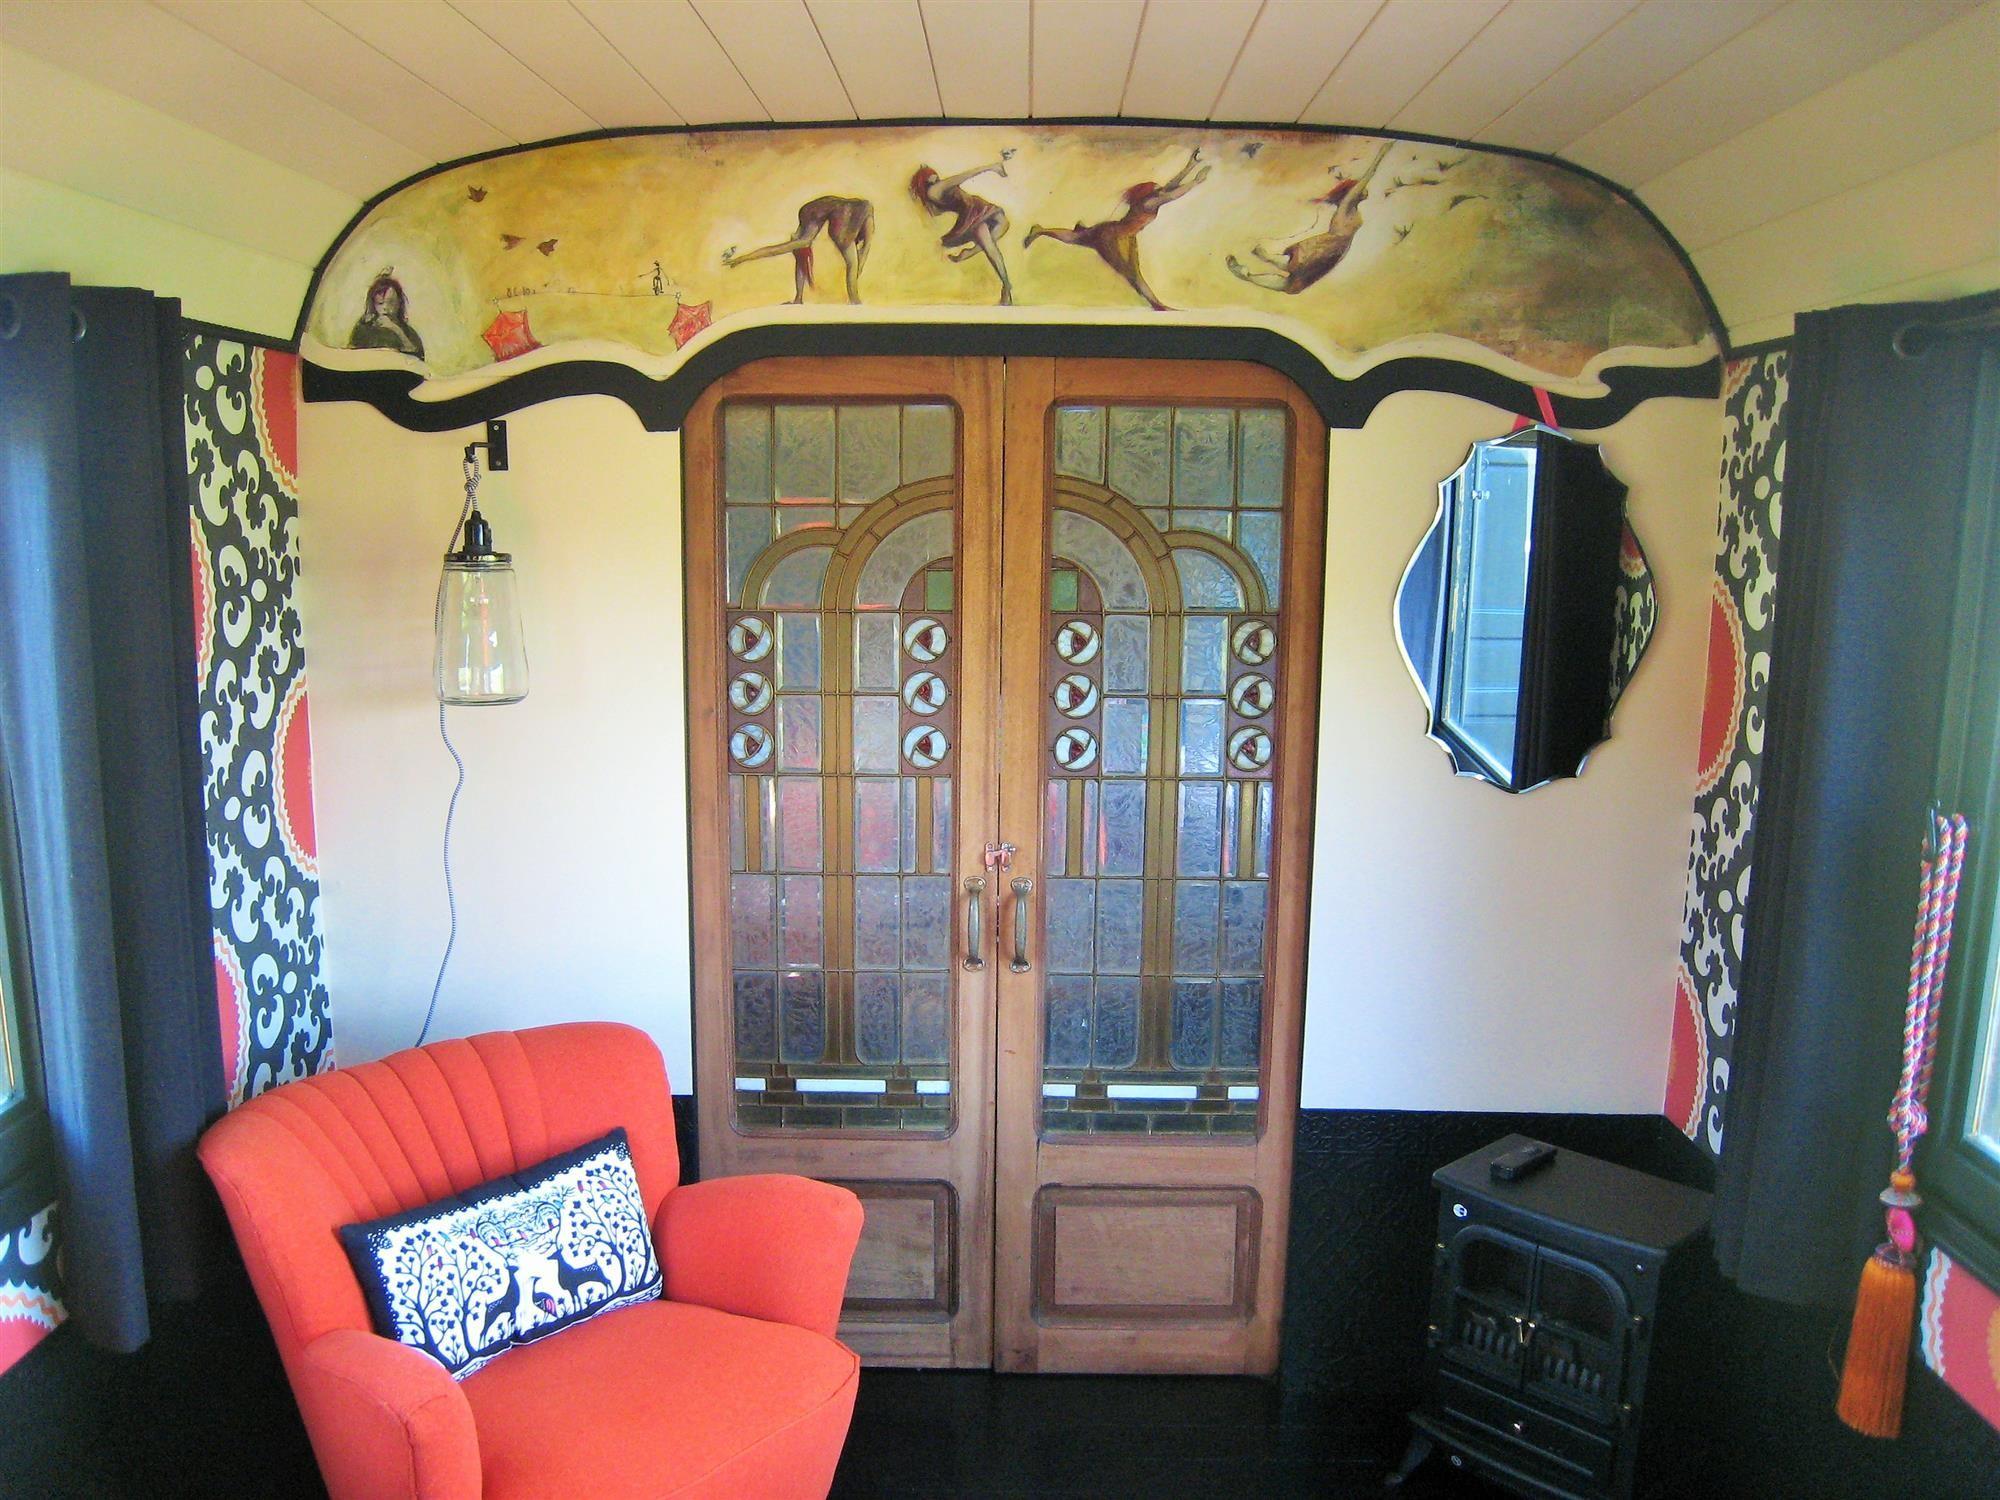 restauration d 39 une roulotte projets d coration am nagement et r novation bretagne k 39 home. Black Bedroom Furniture Sets. Home Design Ideas